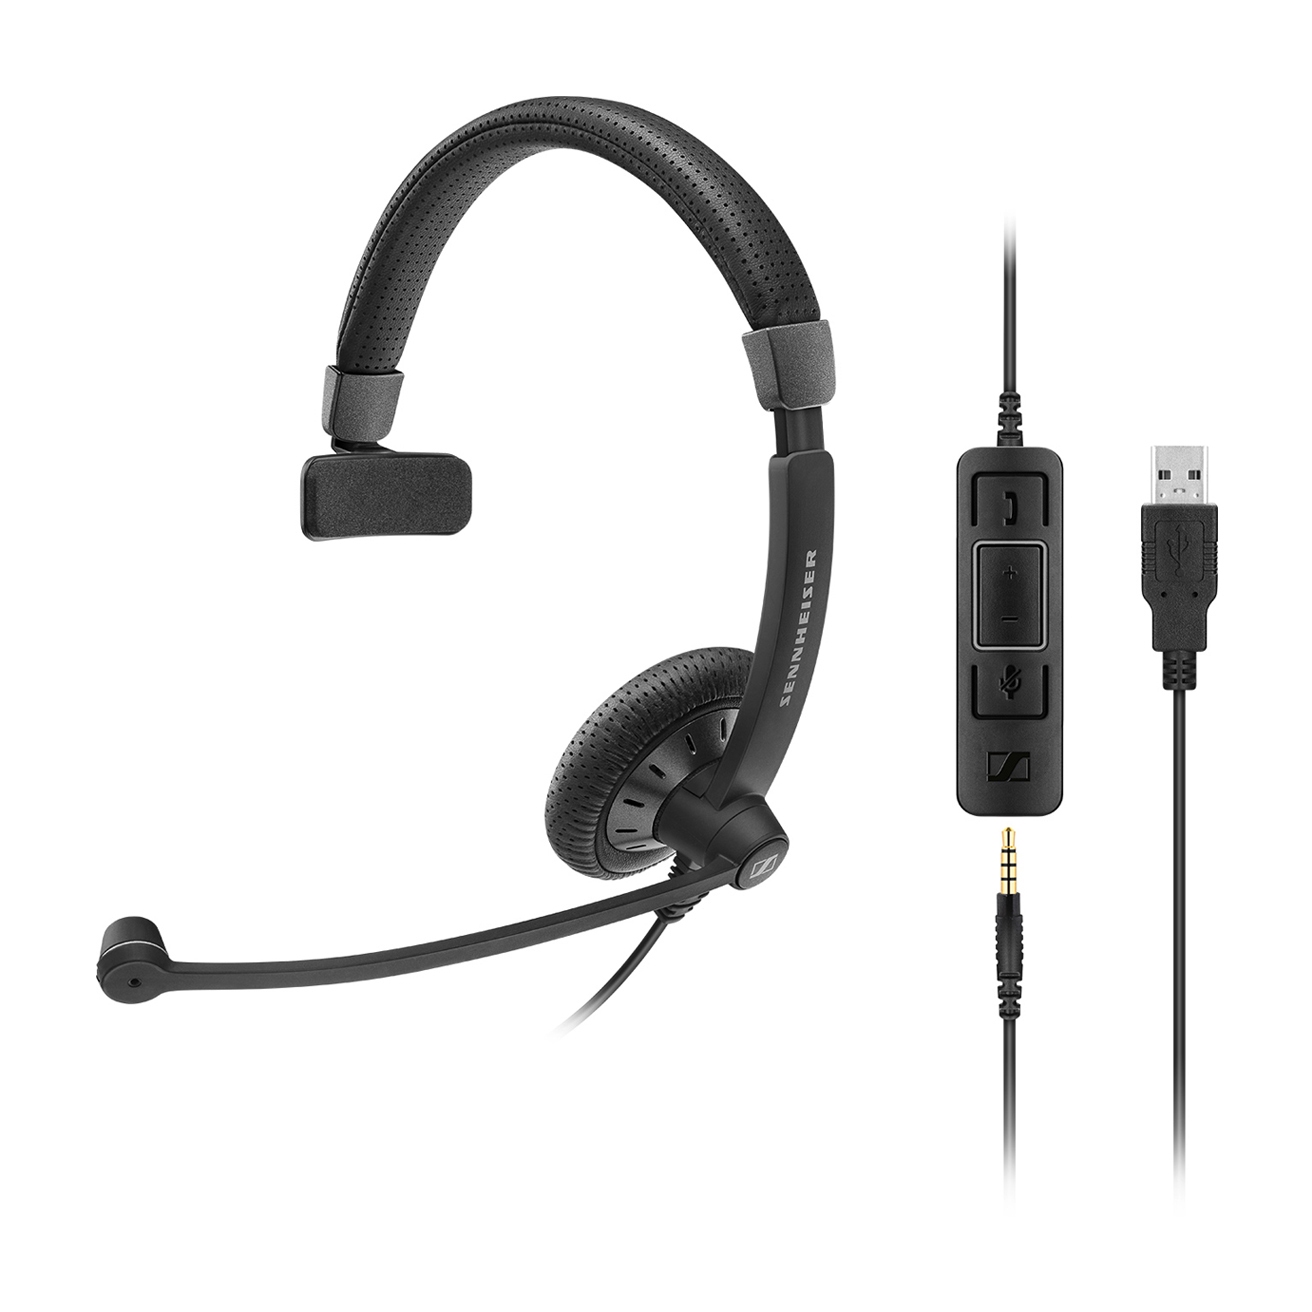 Sennheiser SC 45 USB CTRL Monaural Head-band Black headset